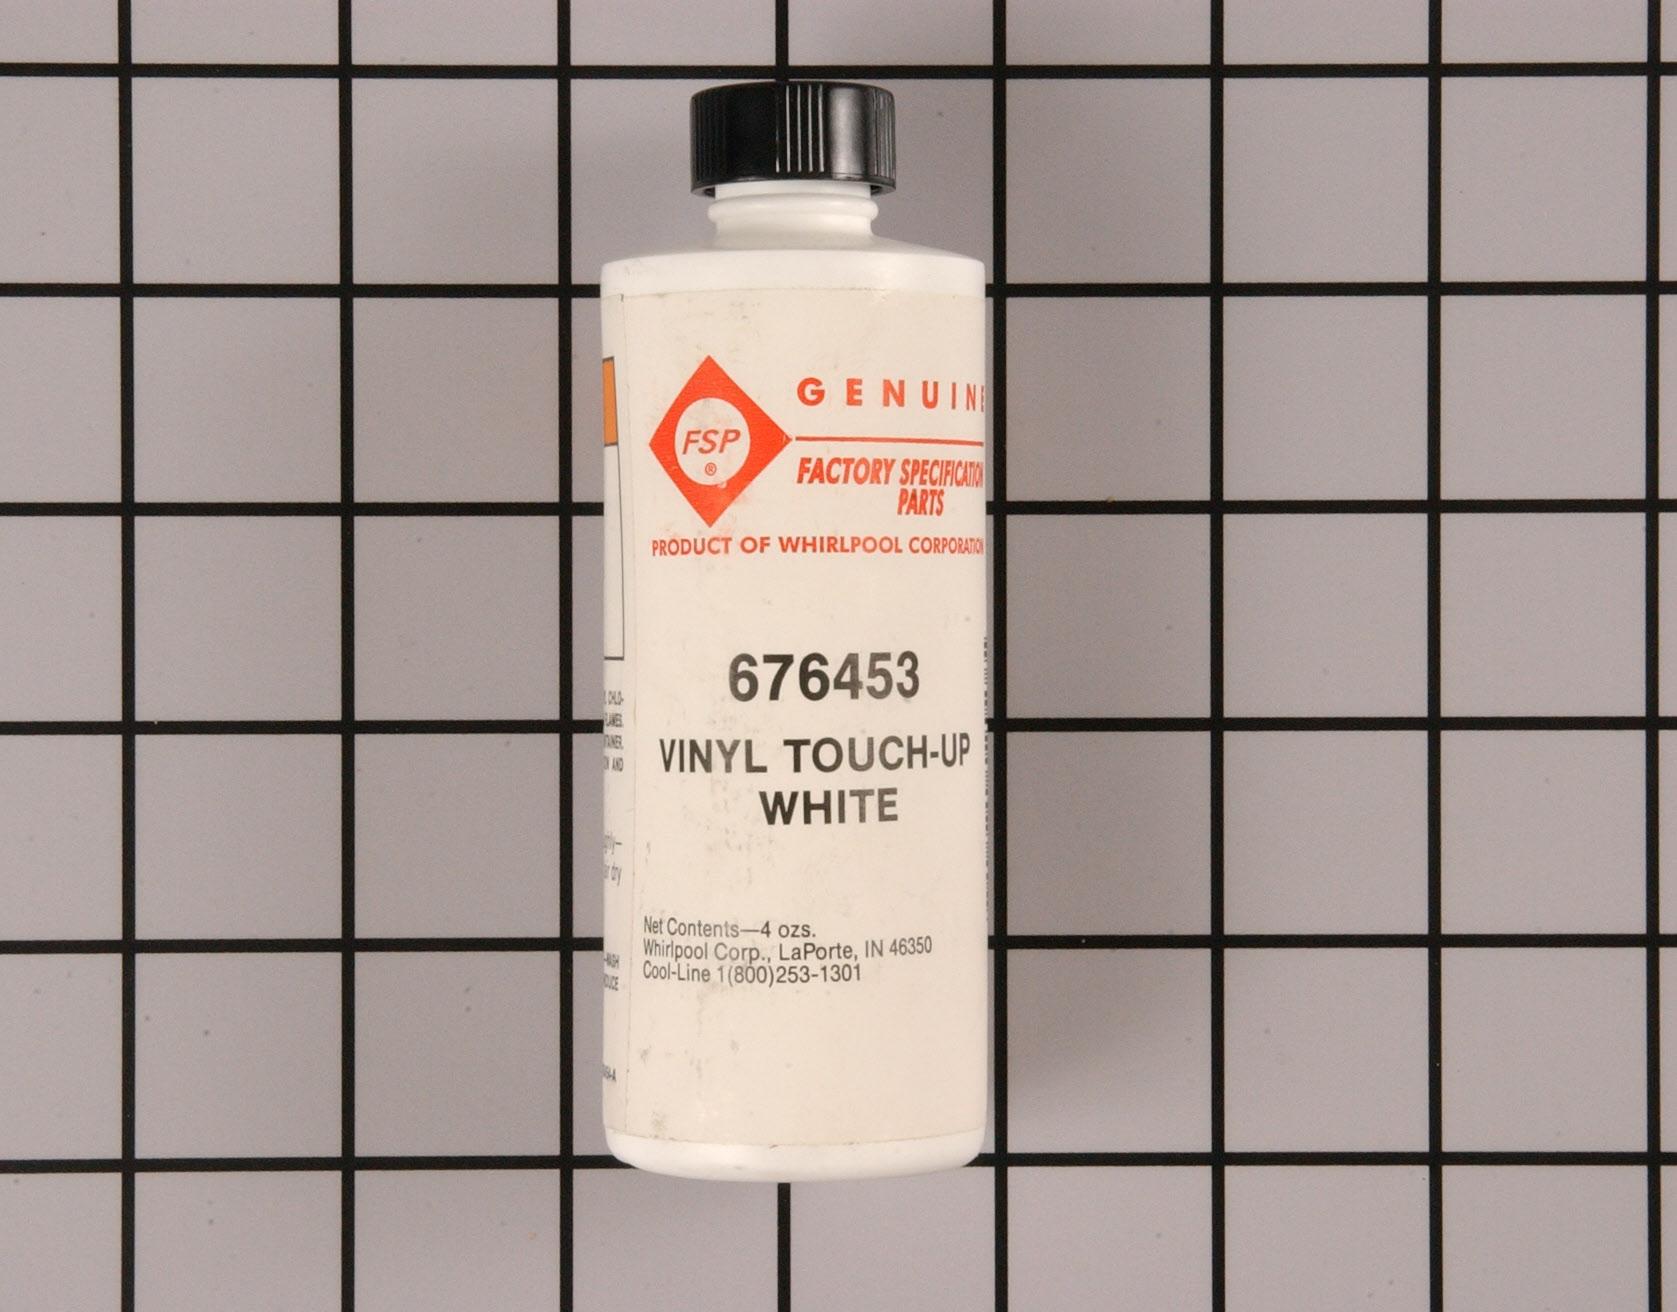 WP676453 Ikea Dishwasher Part -Rack Repair Kit or Paint